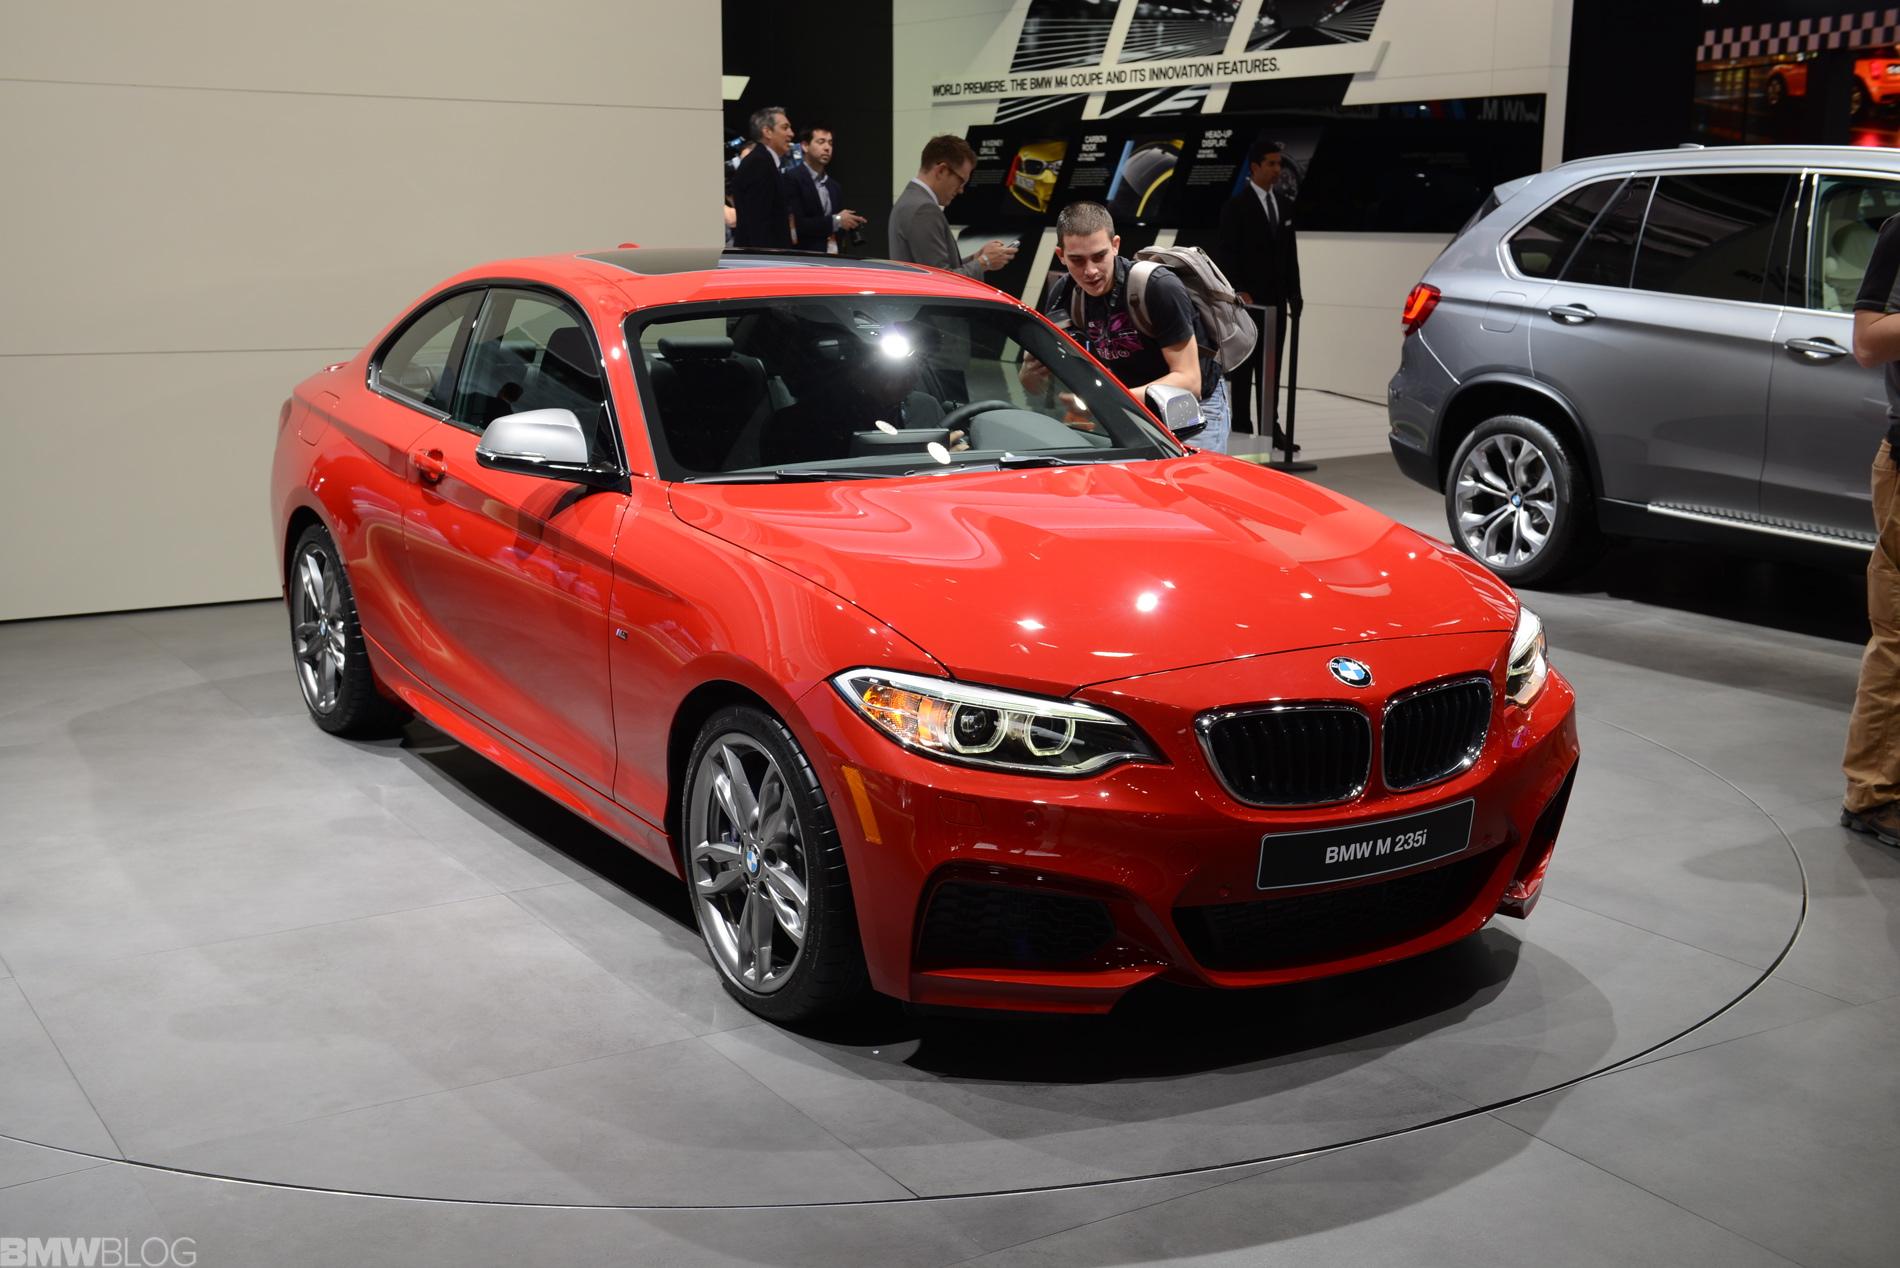 Detroit Auto Show 2014 Live Fotos Zum Bmw M235i In Melbourne Rot